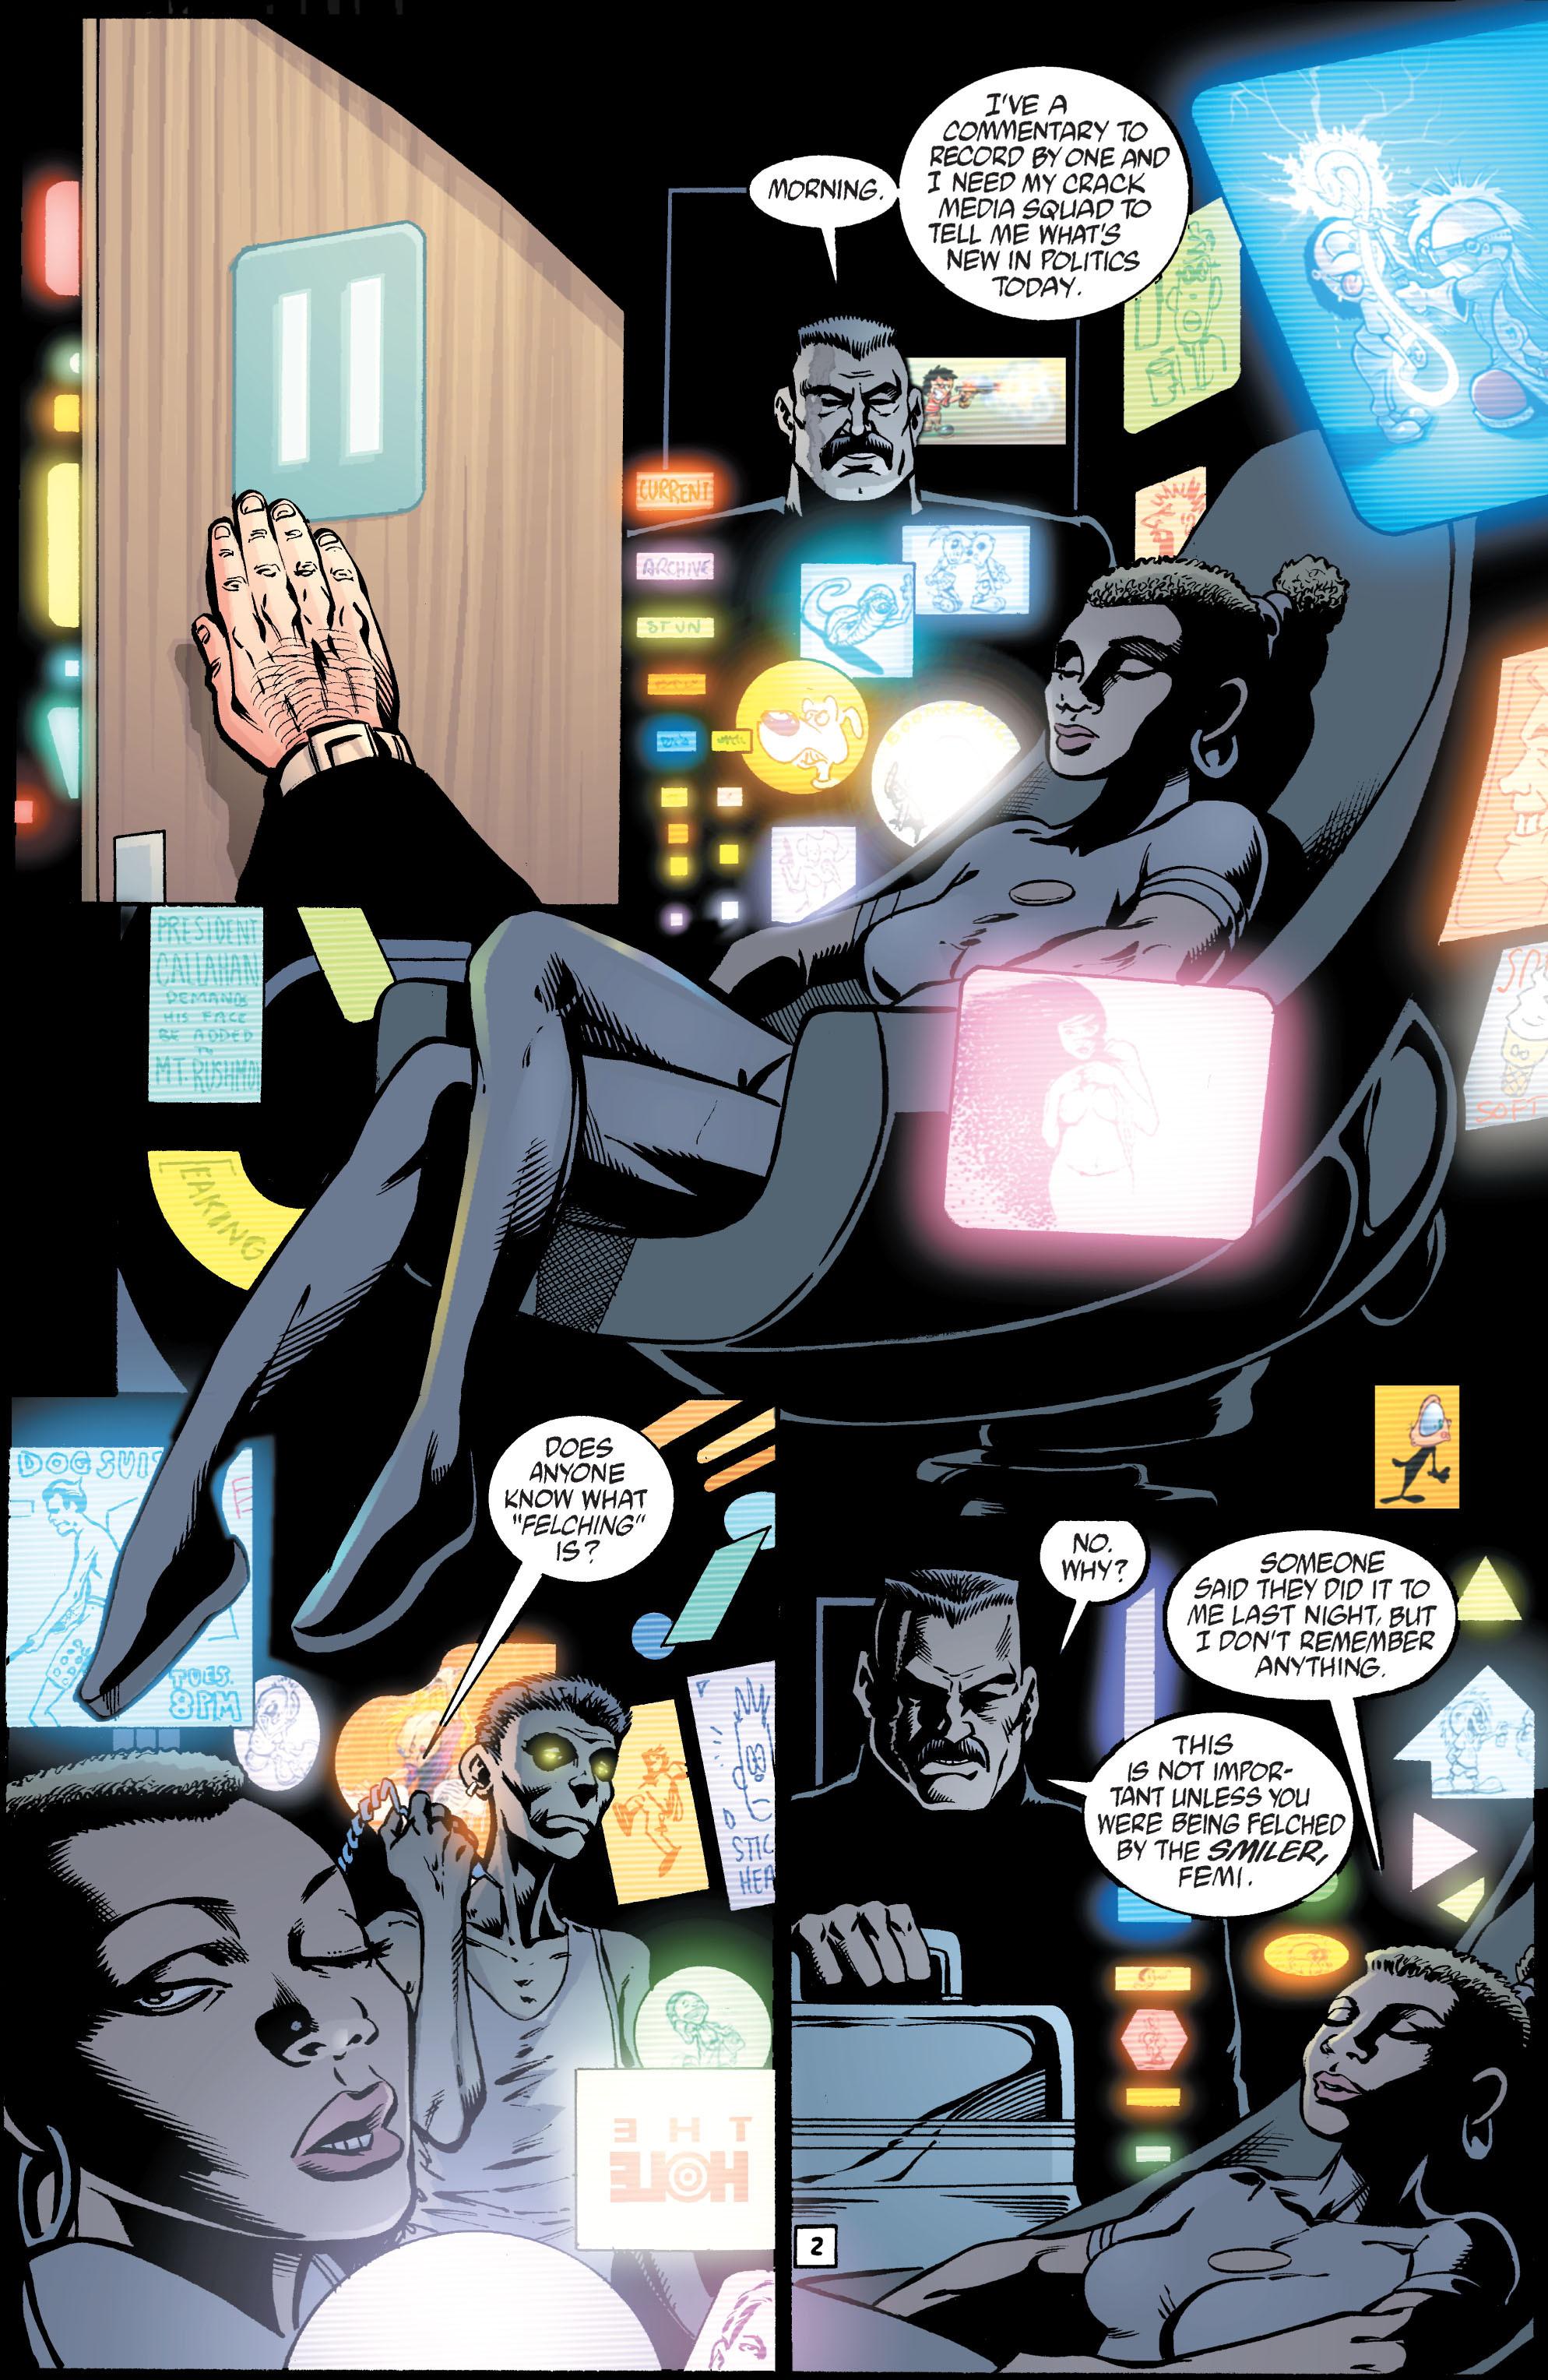 Read online Transmetropolitan comic -  Issue #39 - 3